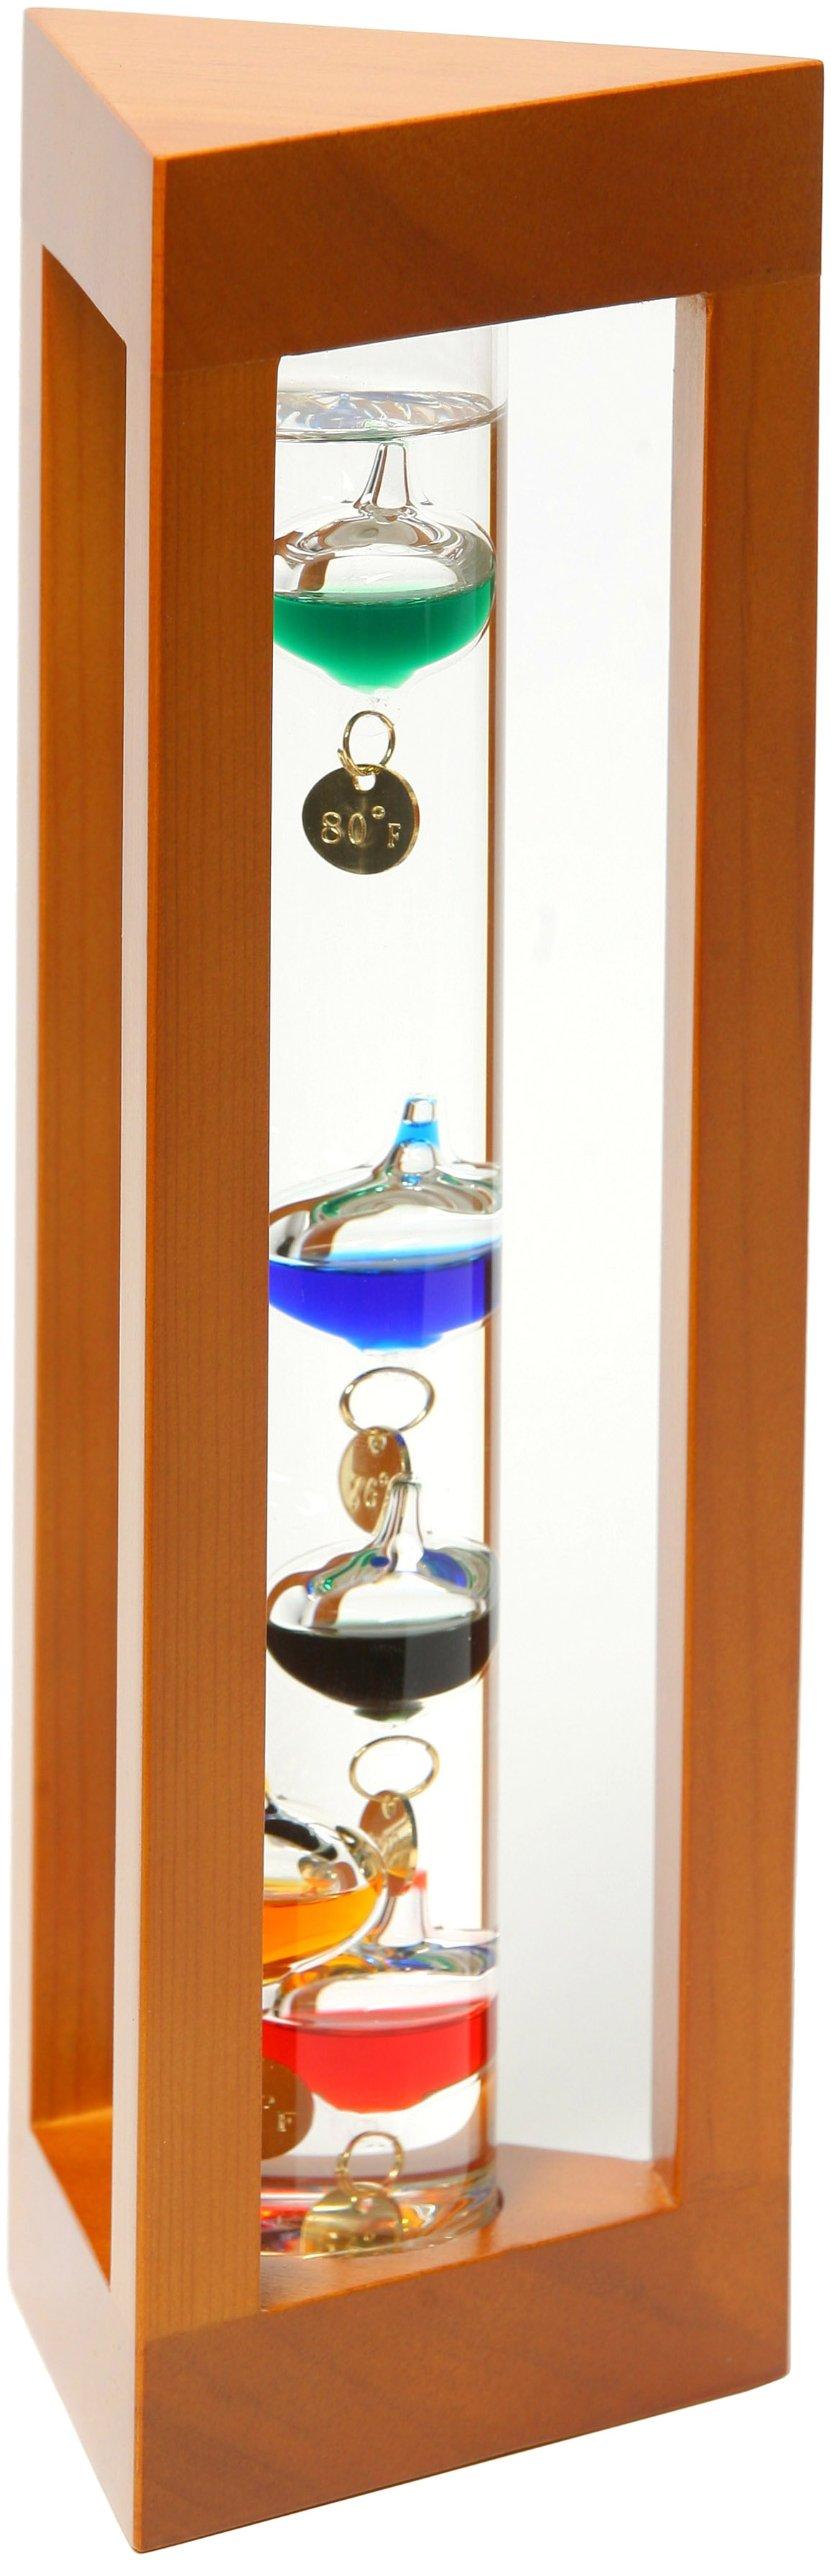 G.W. Schleidt YG527-N Galileo Thermometer Triangle Stand 12-Inch Multicolored by G W Schleidt